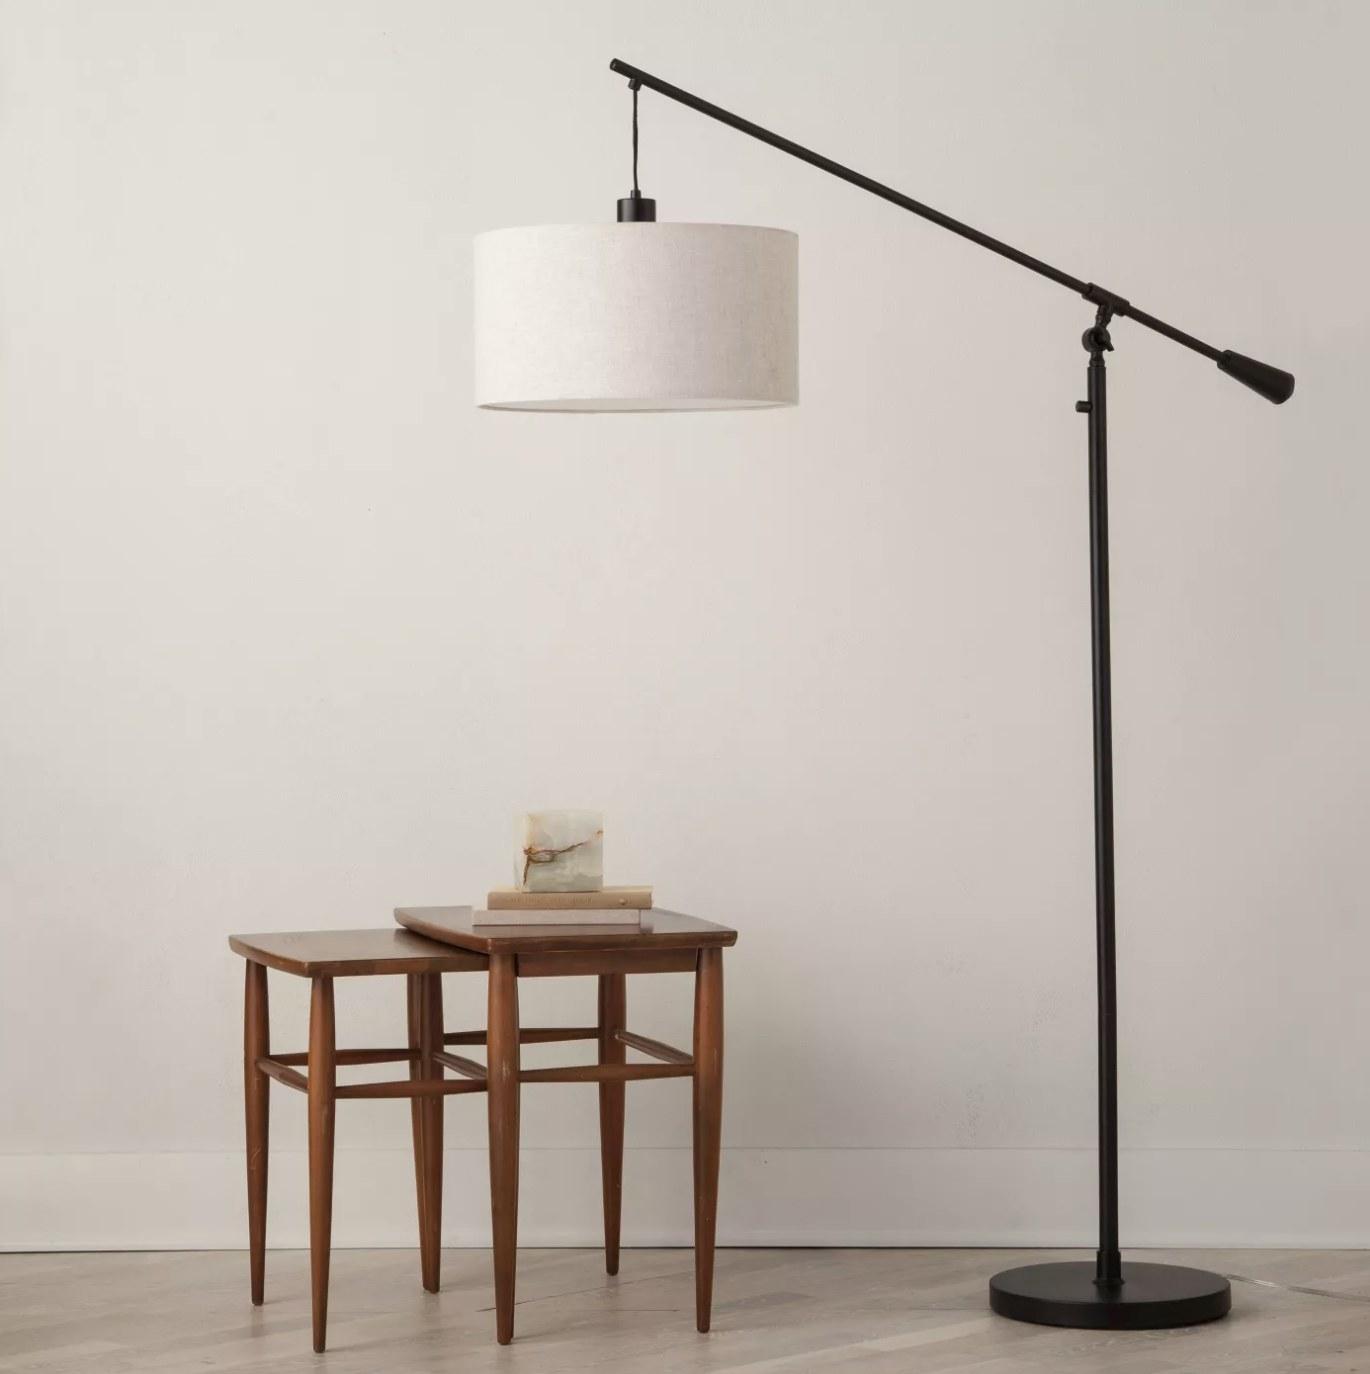 The black floor lamp